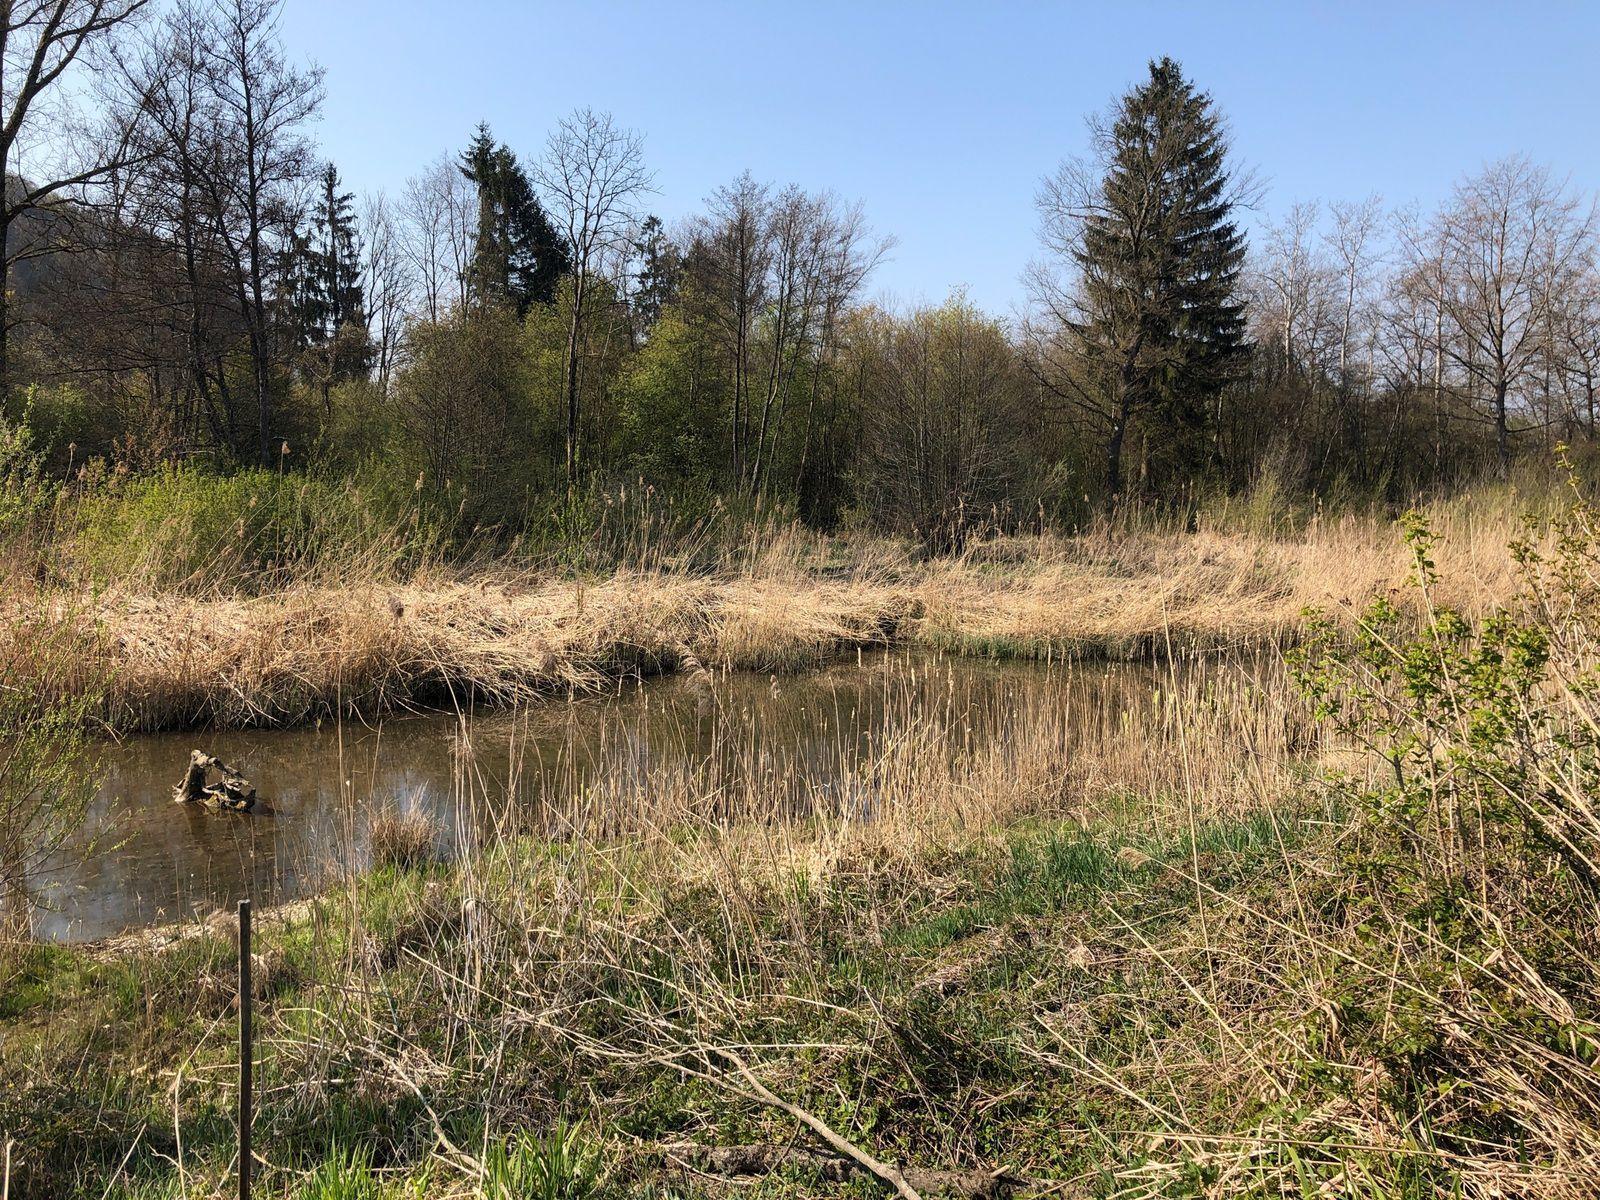 Mardi 20 Avril : La vieille Aar de Büren à Aarberg